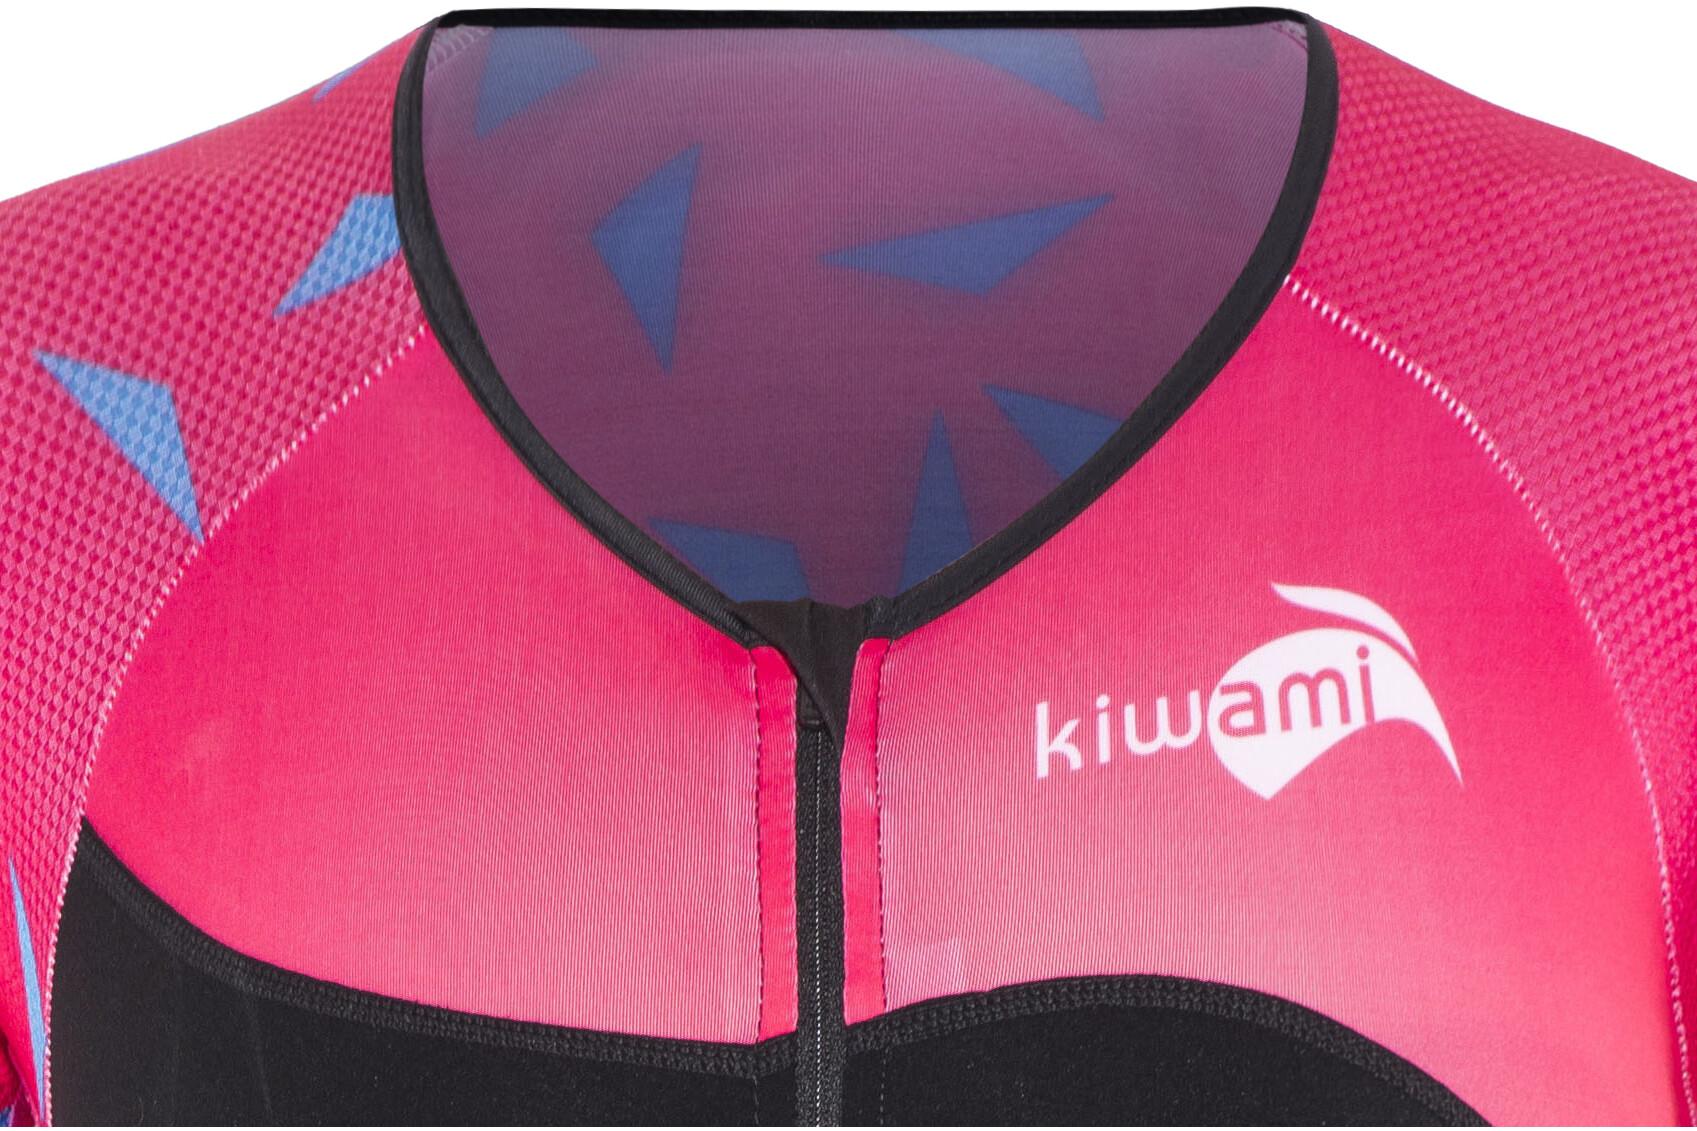 f55b193b0eb0d3 KiWAMi Tokyo LD Aero Trisuit Damen black/sakura/pink günstig kaufen ...